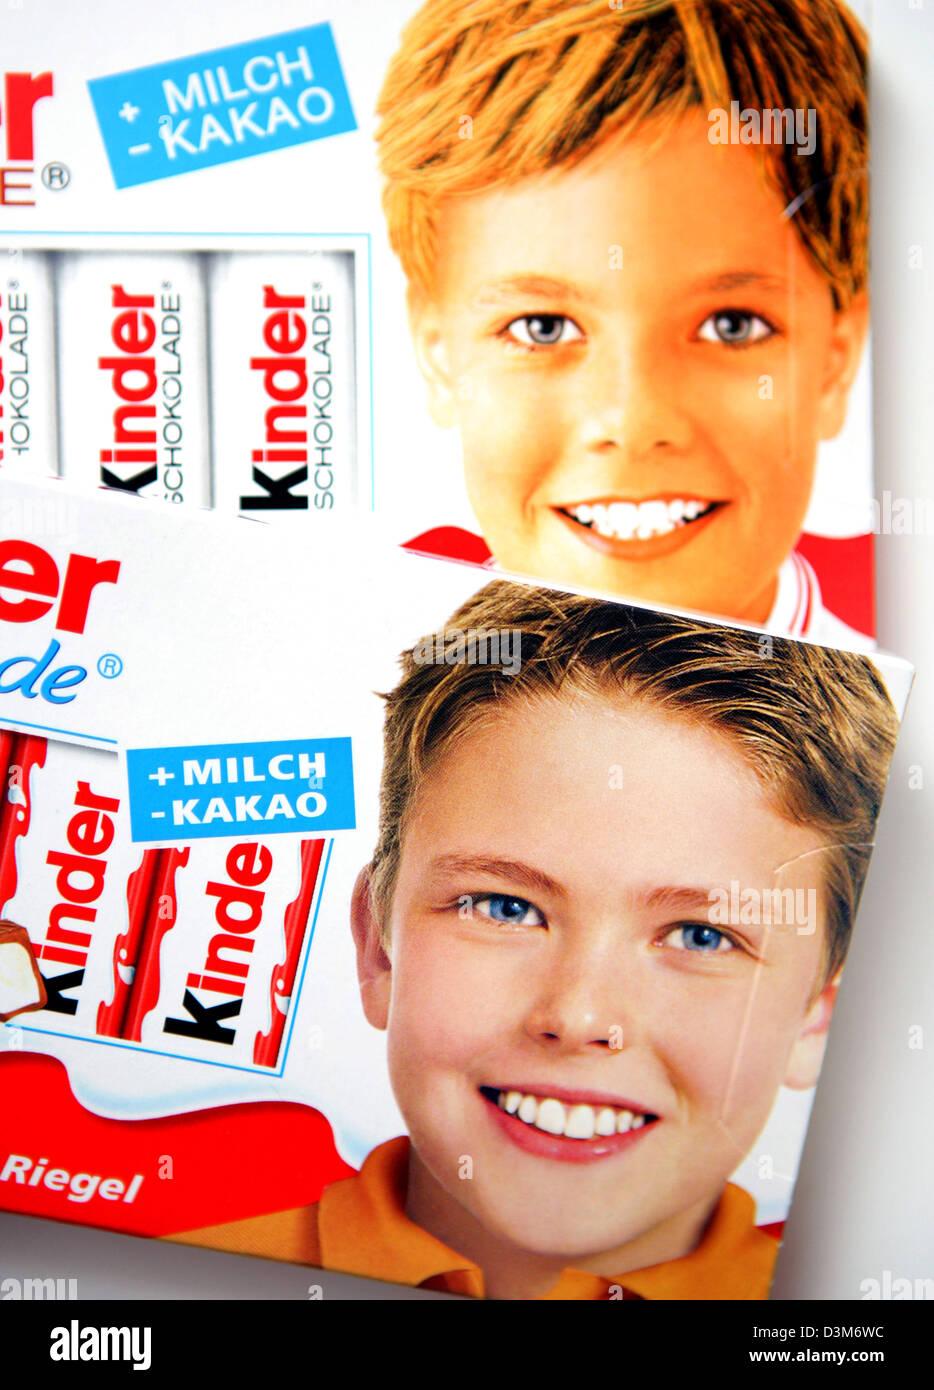 Kinderschokolade Junge Früher